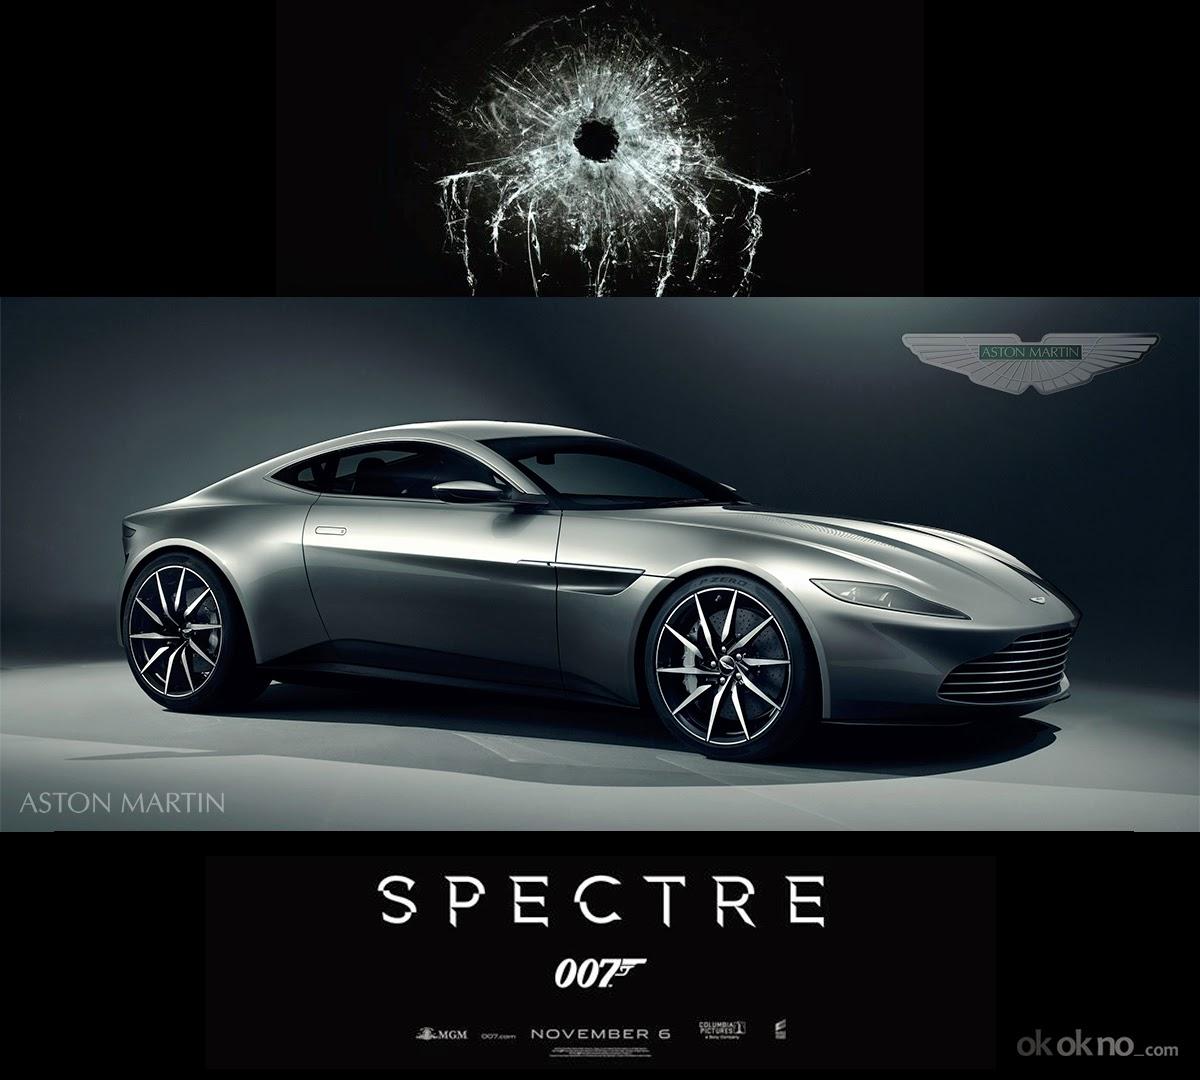 http://okoknoinc.blogspot.com/2014/12/james-bond-24-spectre-aston-martin-db10.html